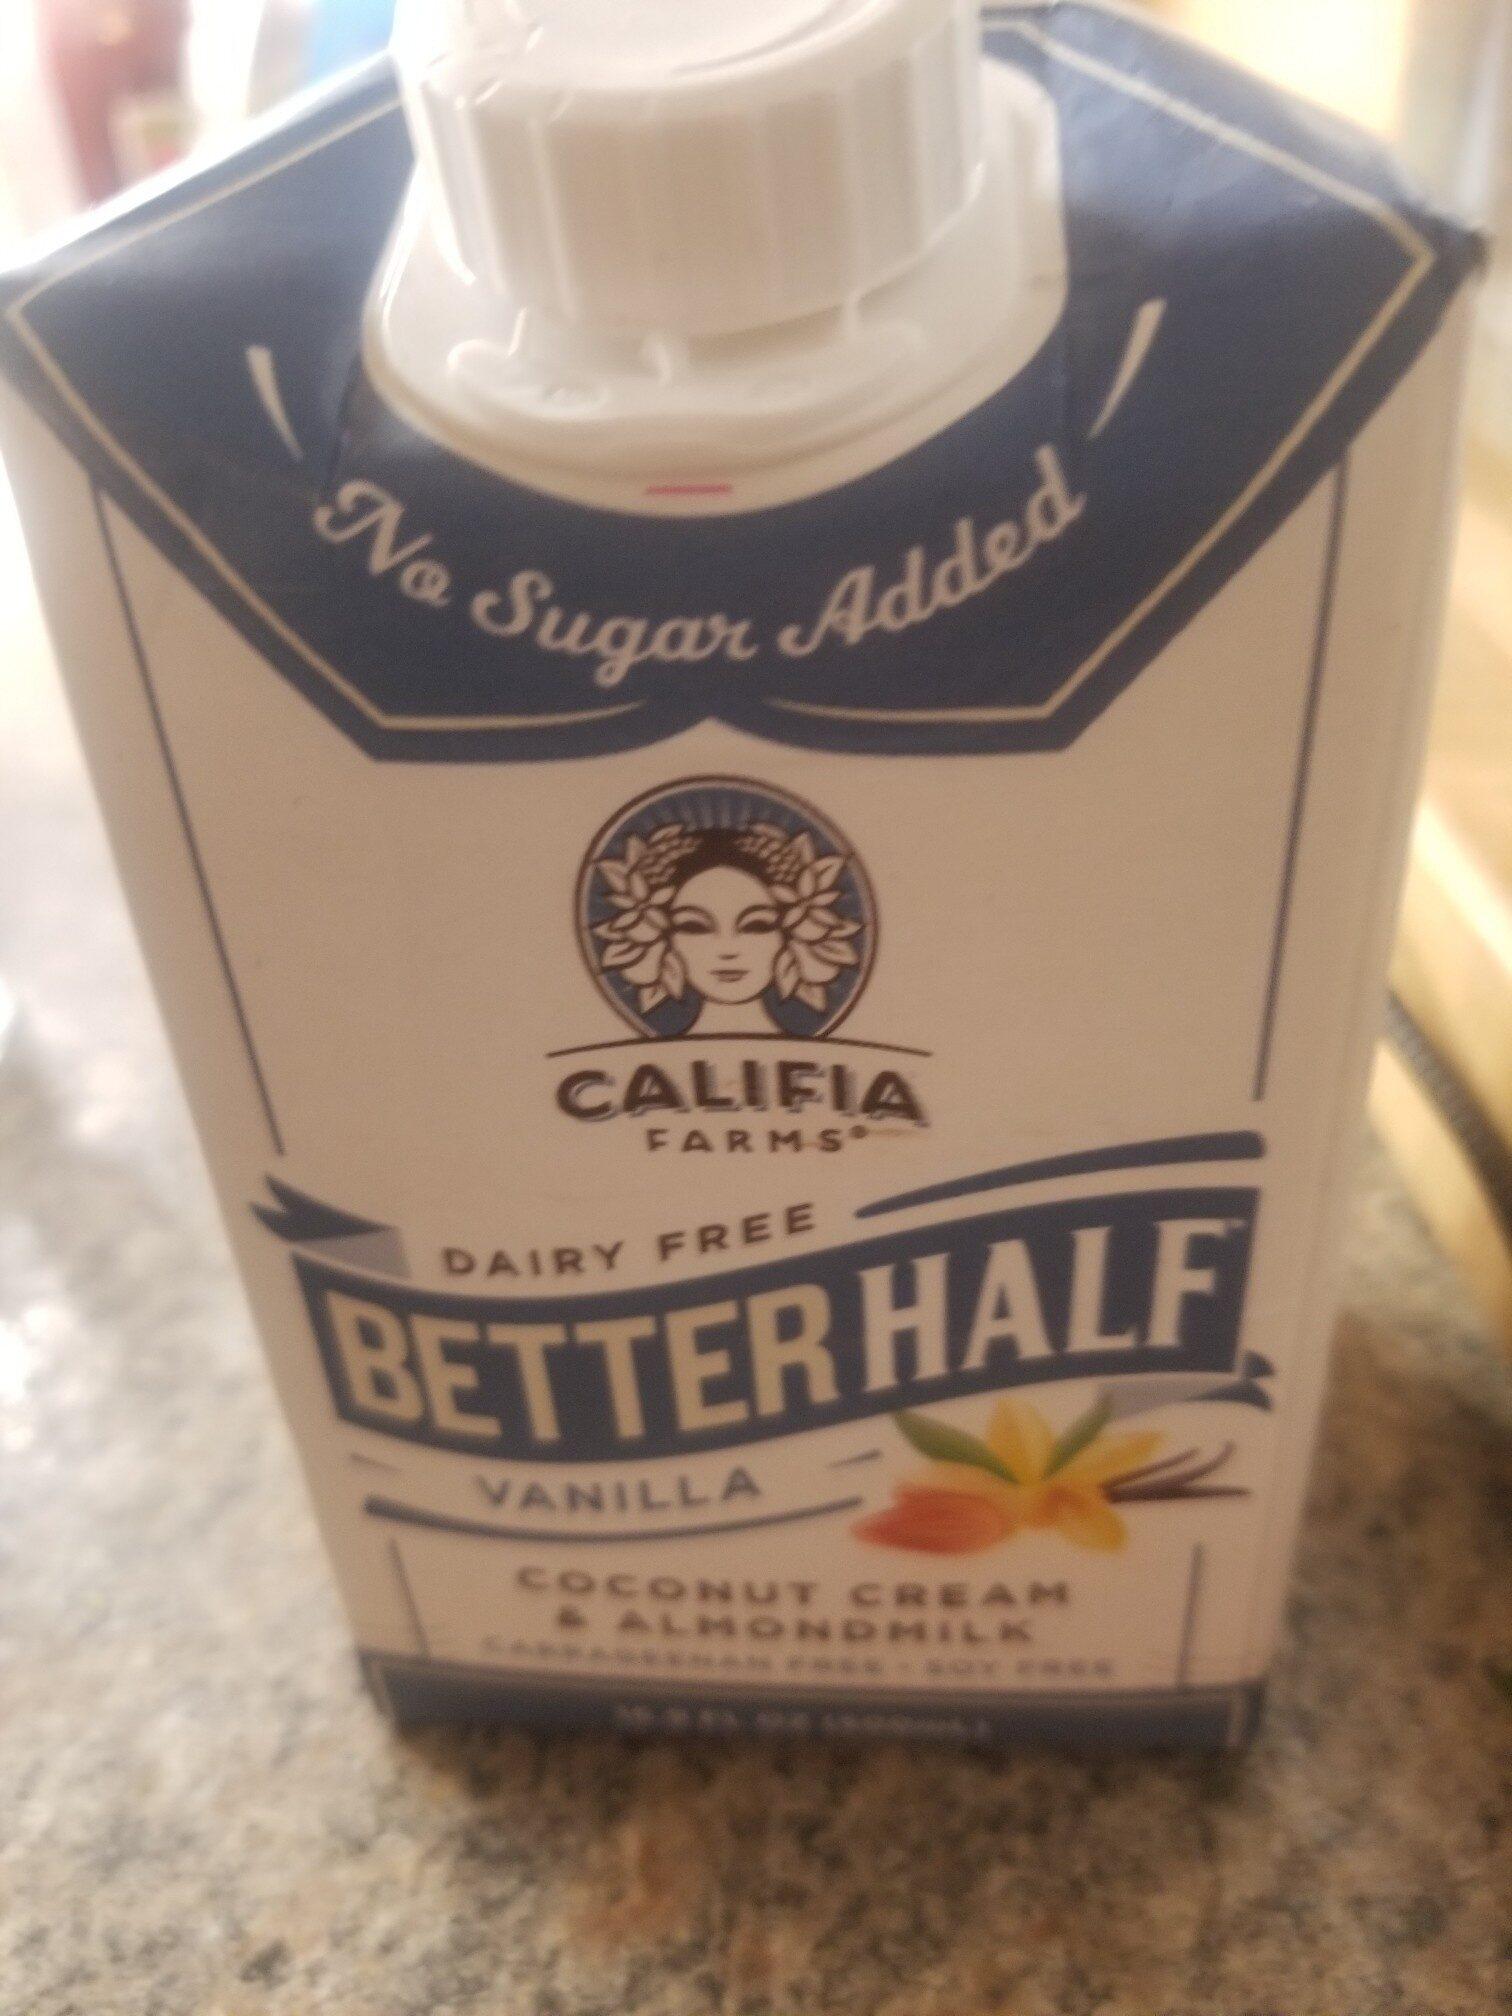 Coconut cream & almondmilk, vanilla - Product - en